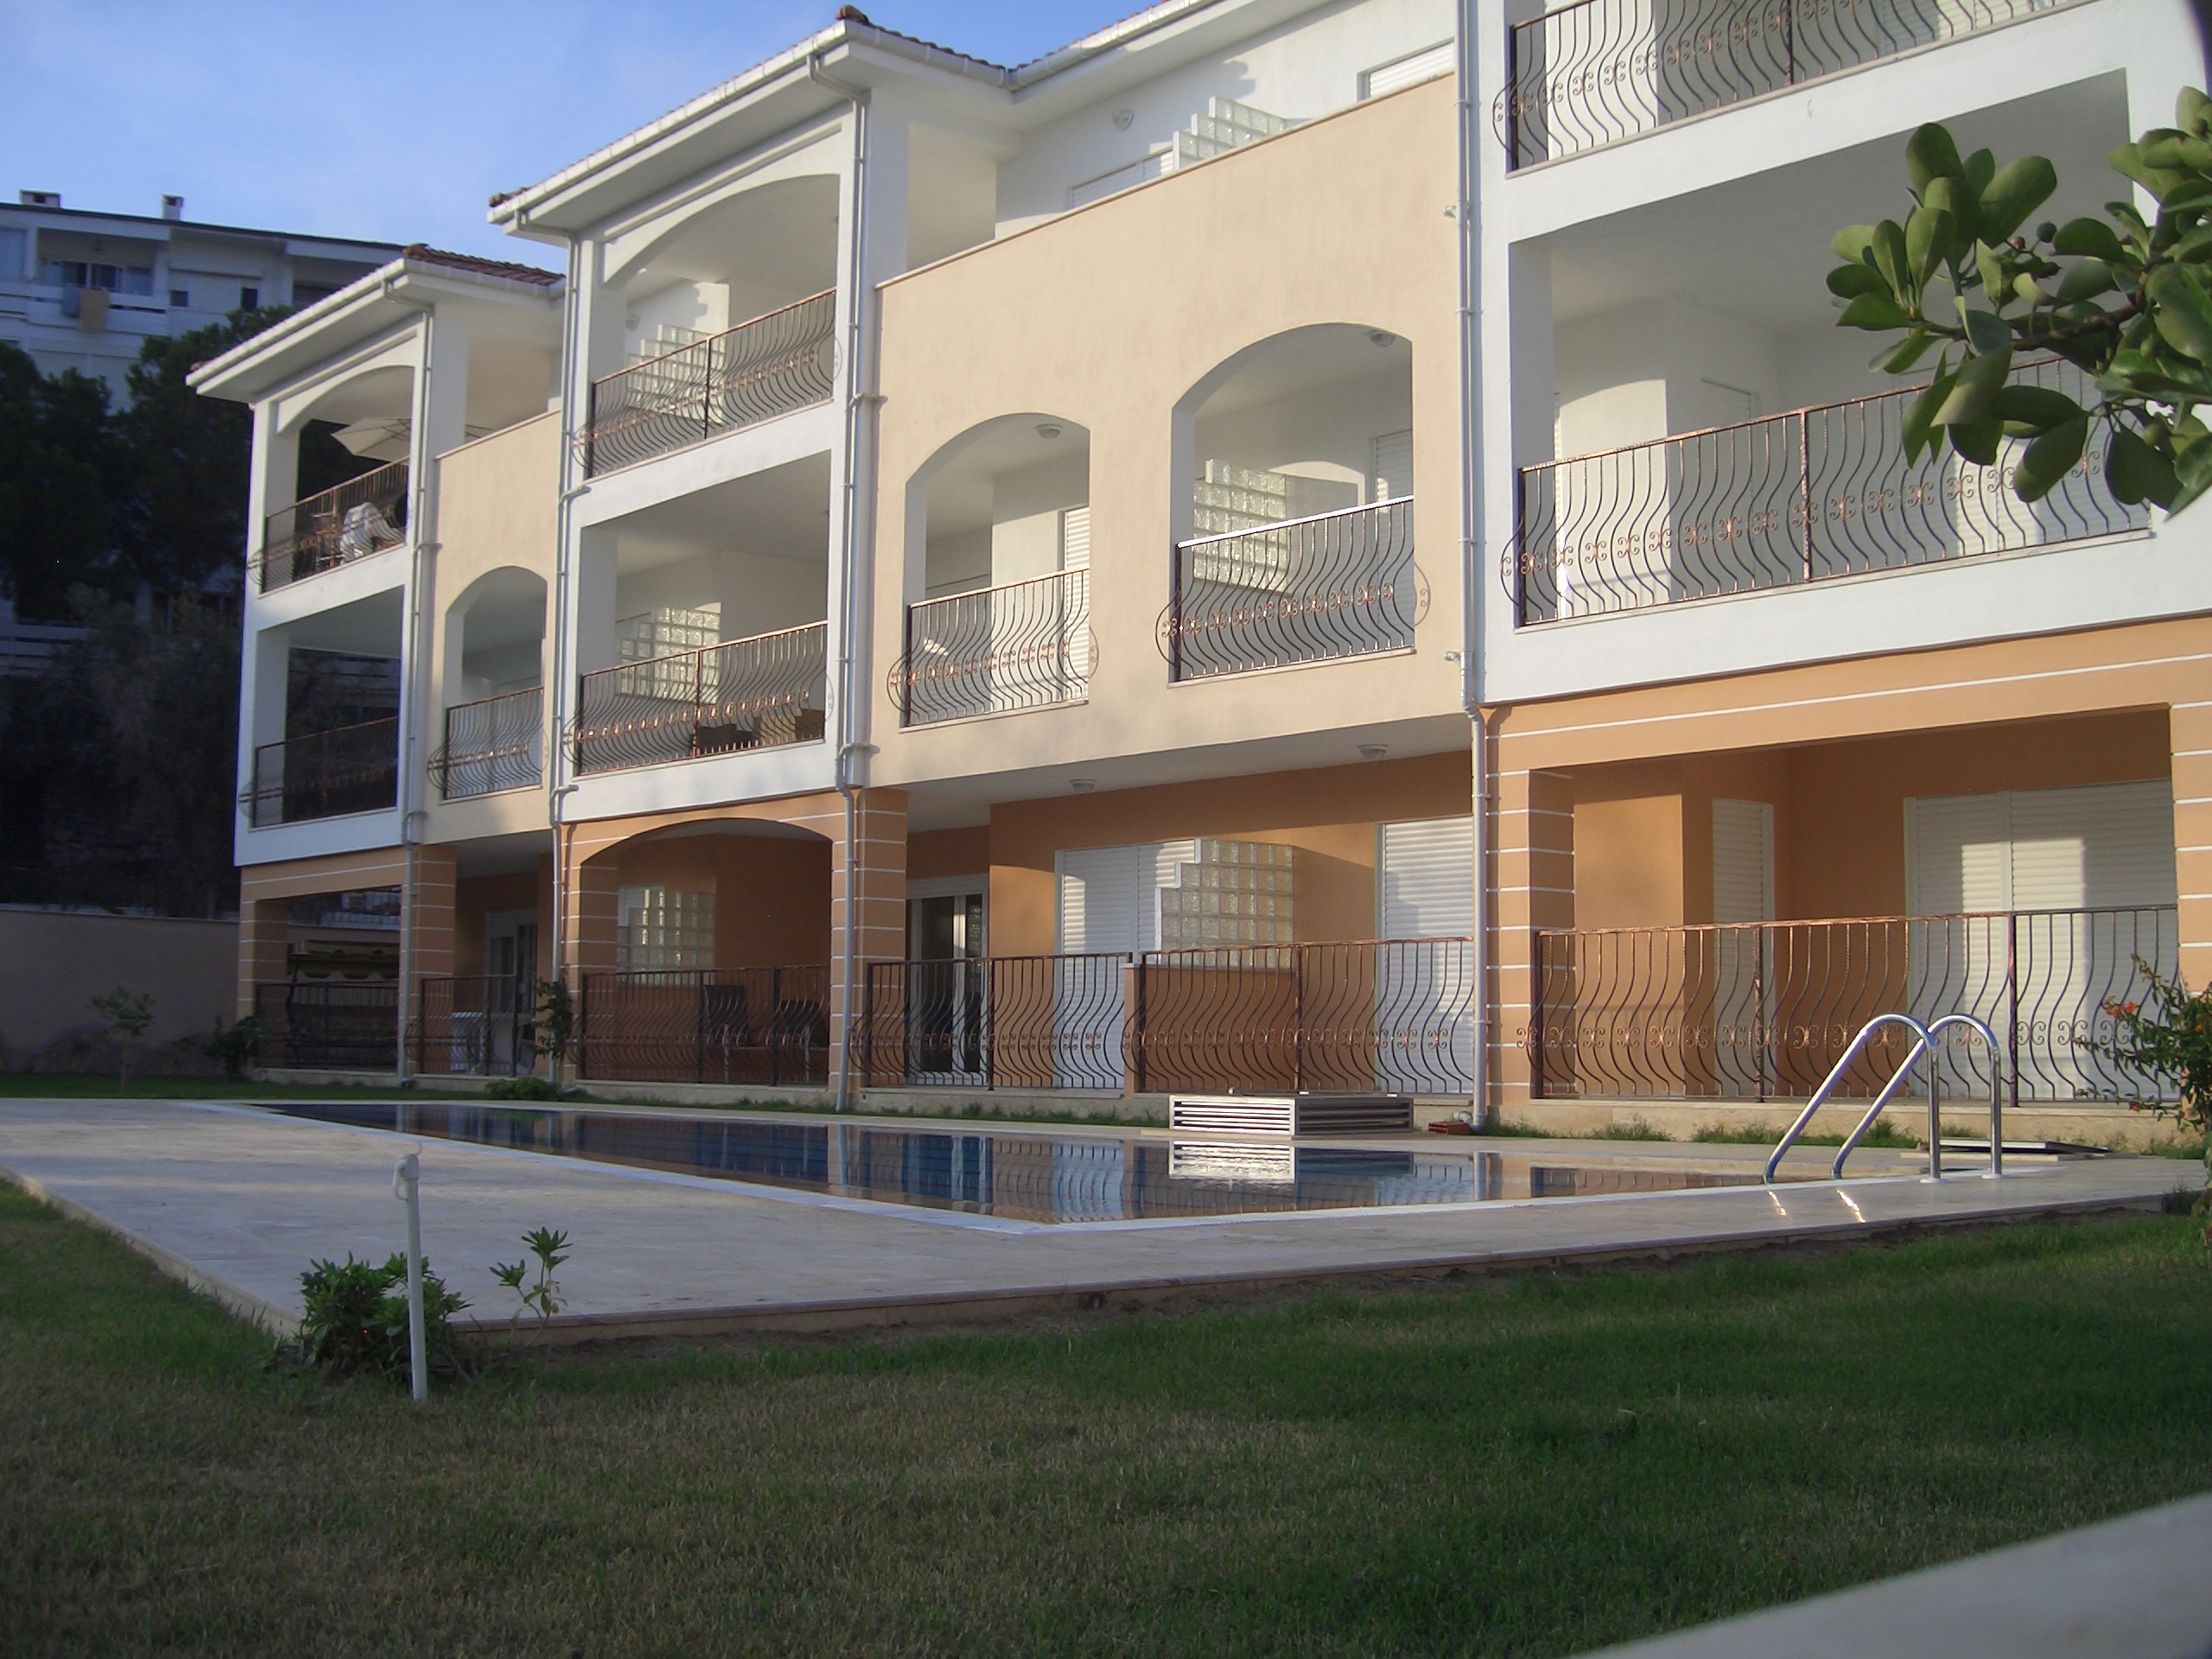 Kleinschalig complex : slechts 9 appartementen